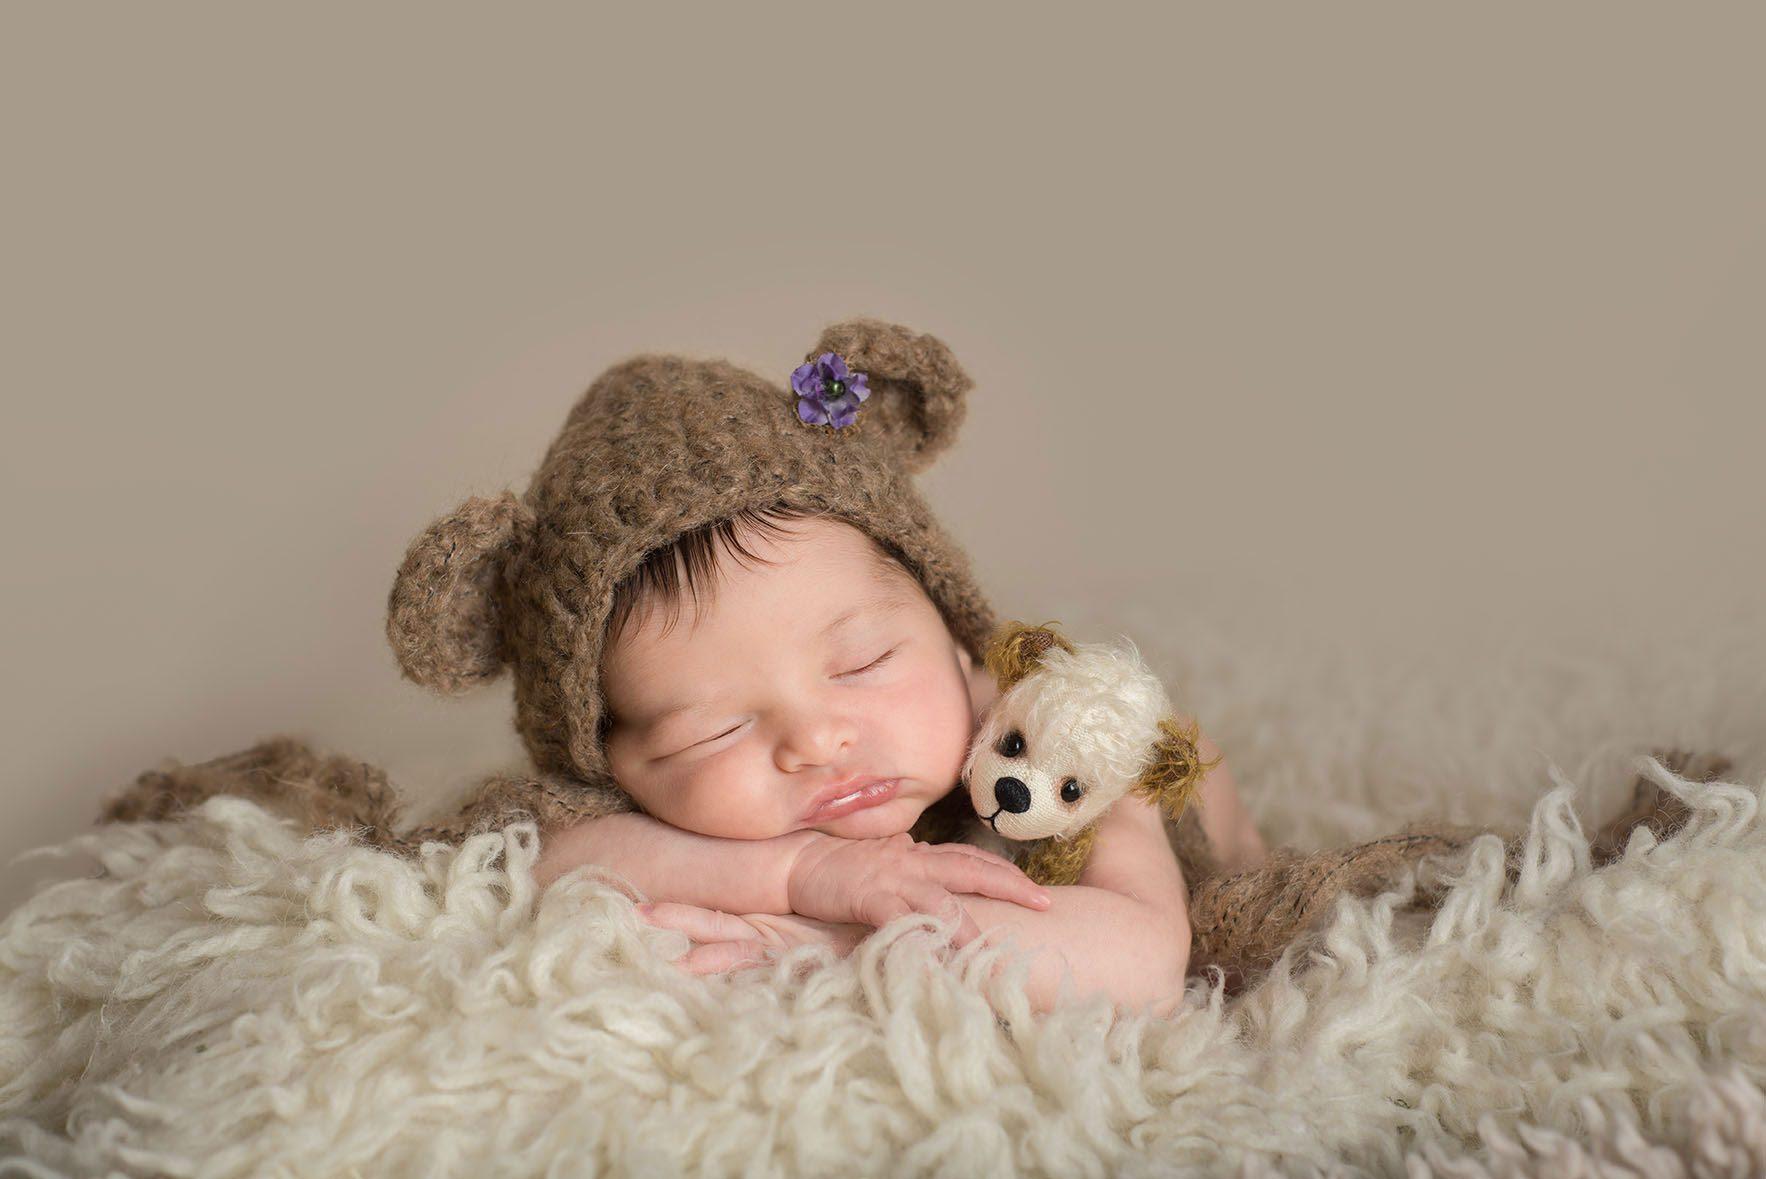 Colchester Essex newborn laying cuddling a teddy bear - Essex newborn photographer